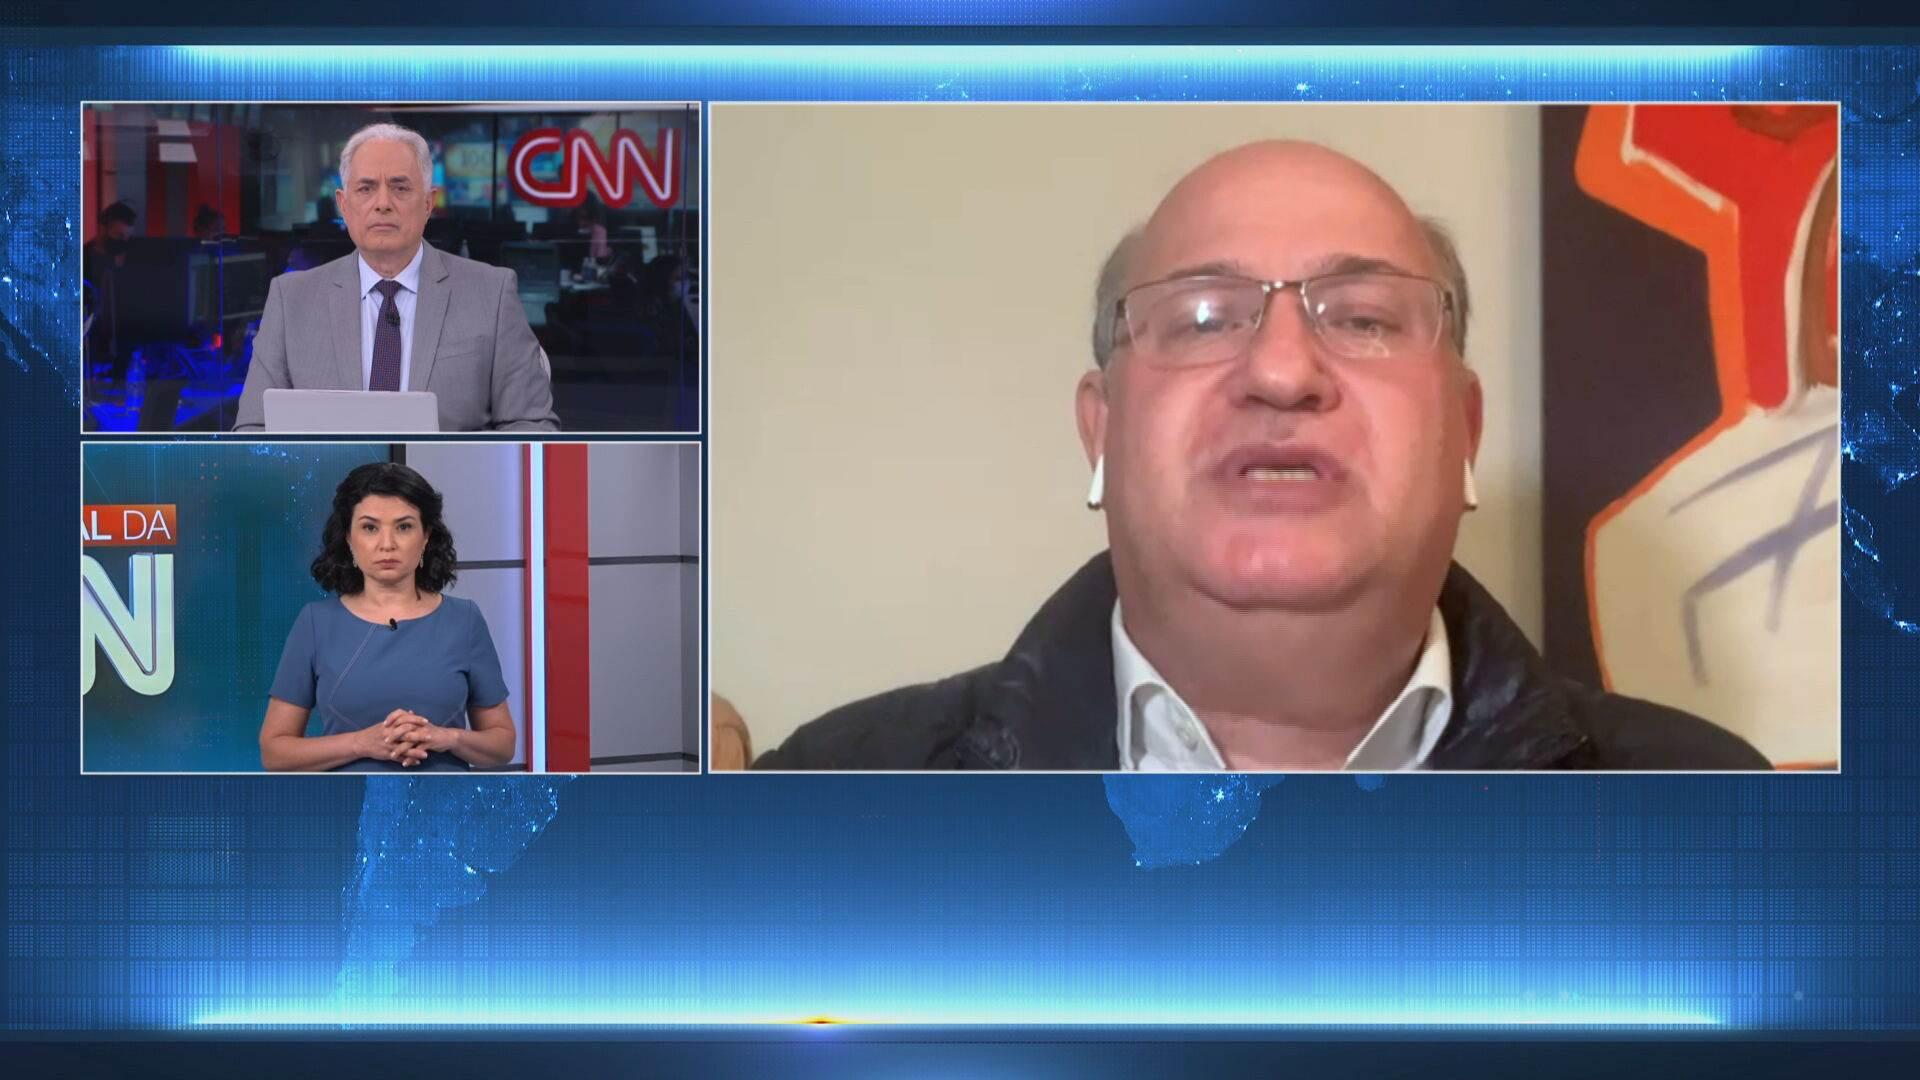 Ilan Goldfajn em entrevista à CNN